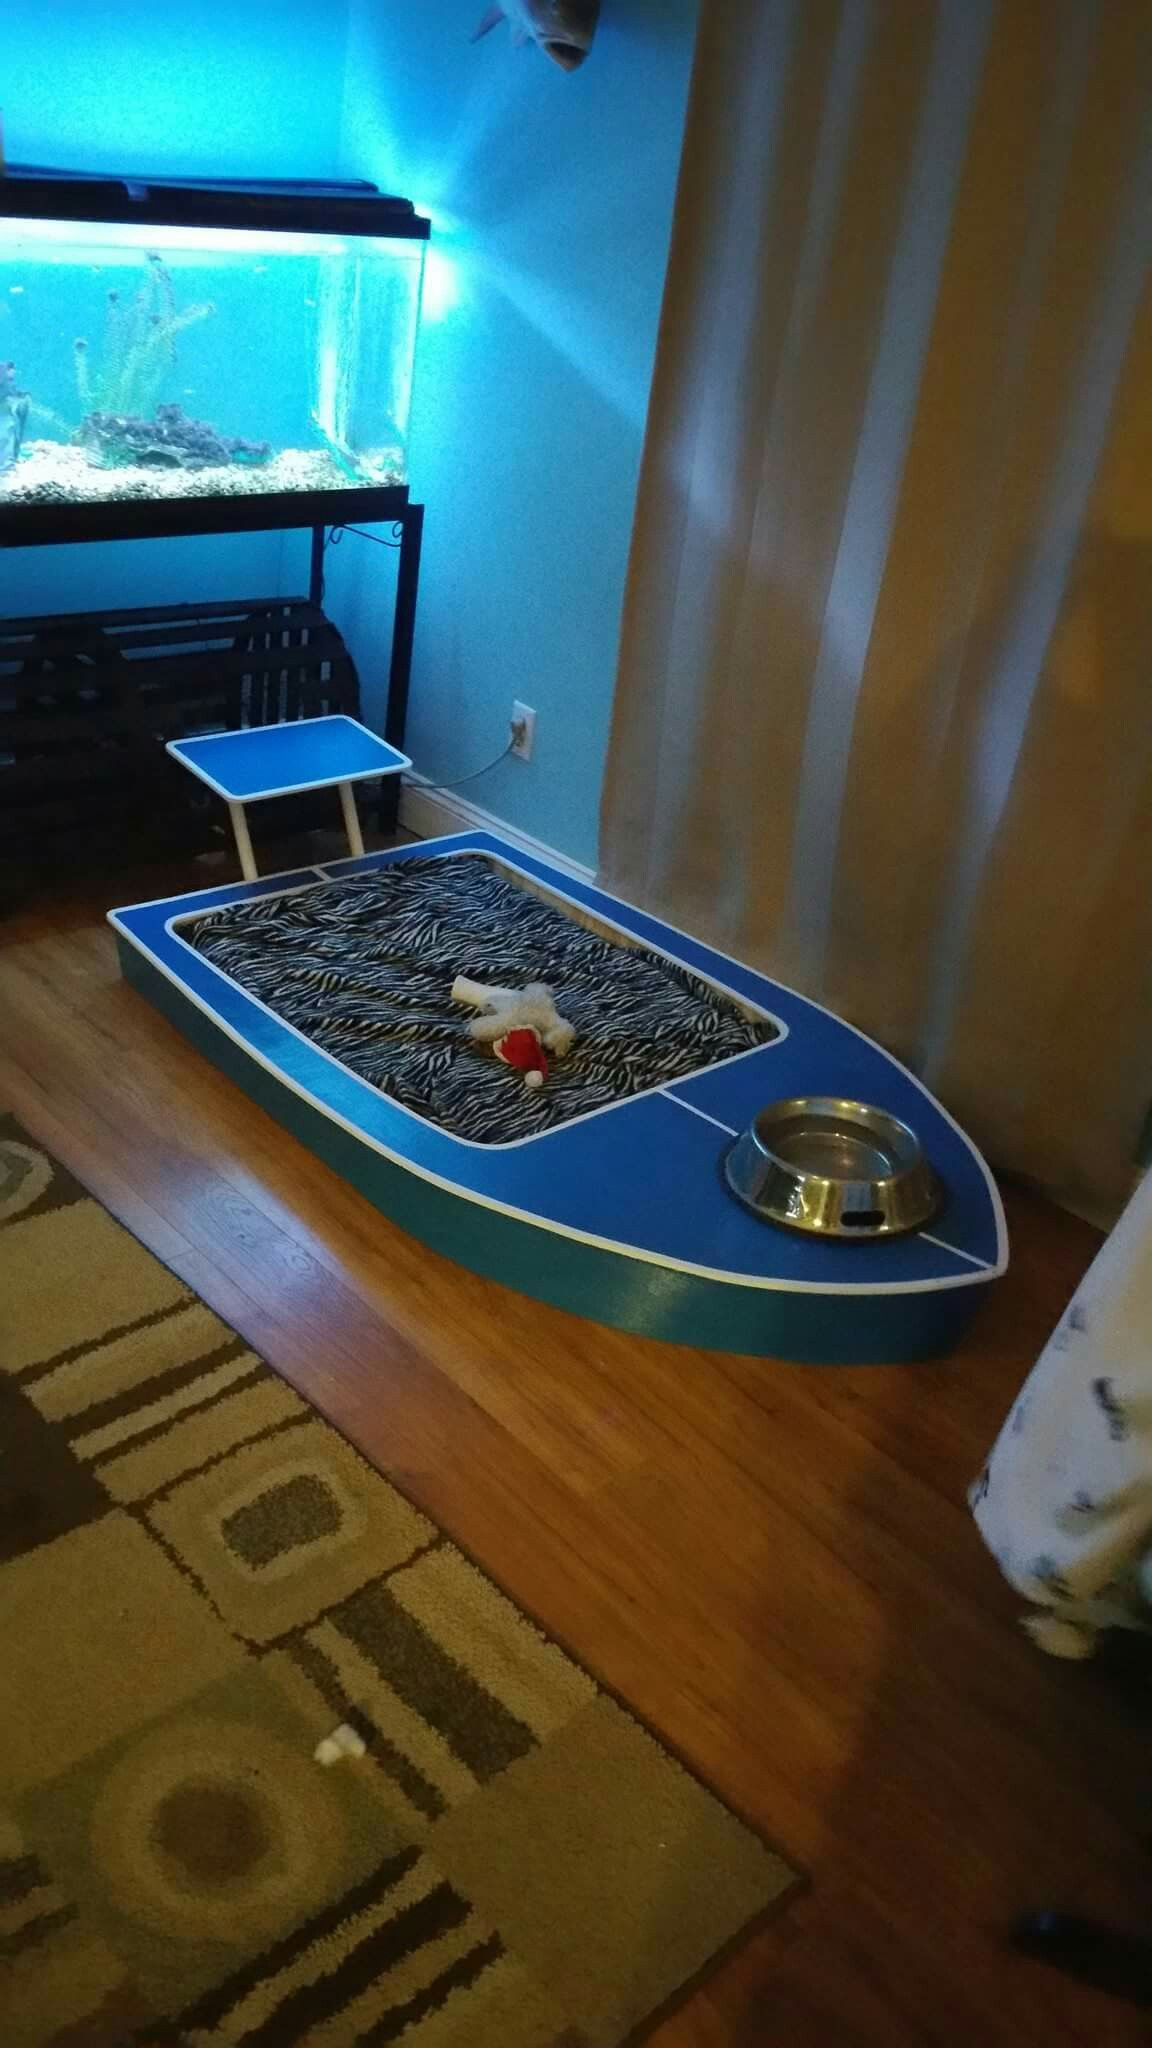 Flats Boat Dog Bed Dog Bed Puppies Flats Boat